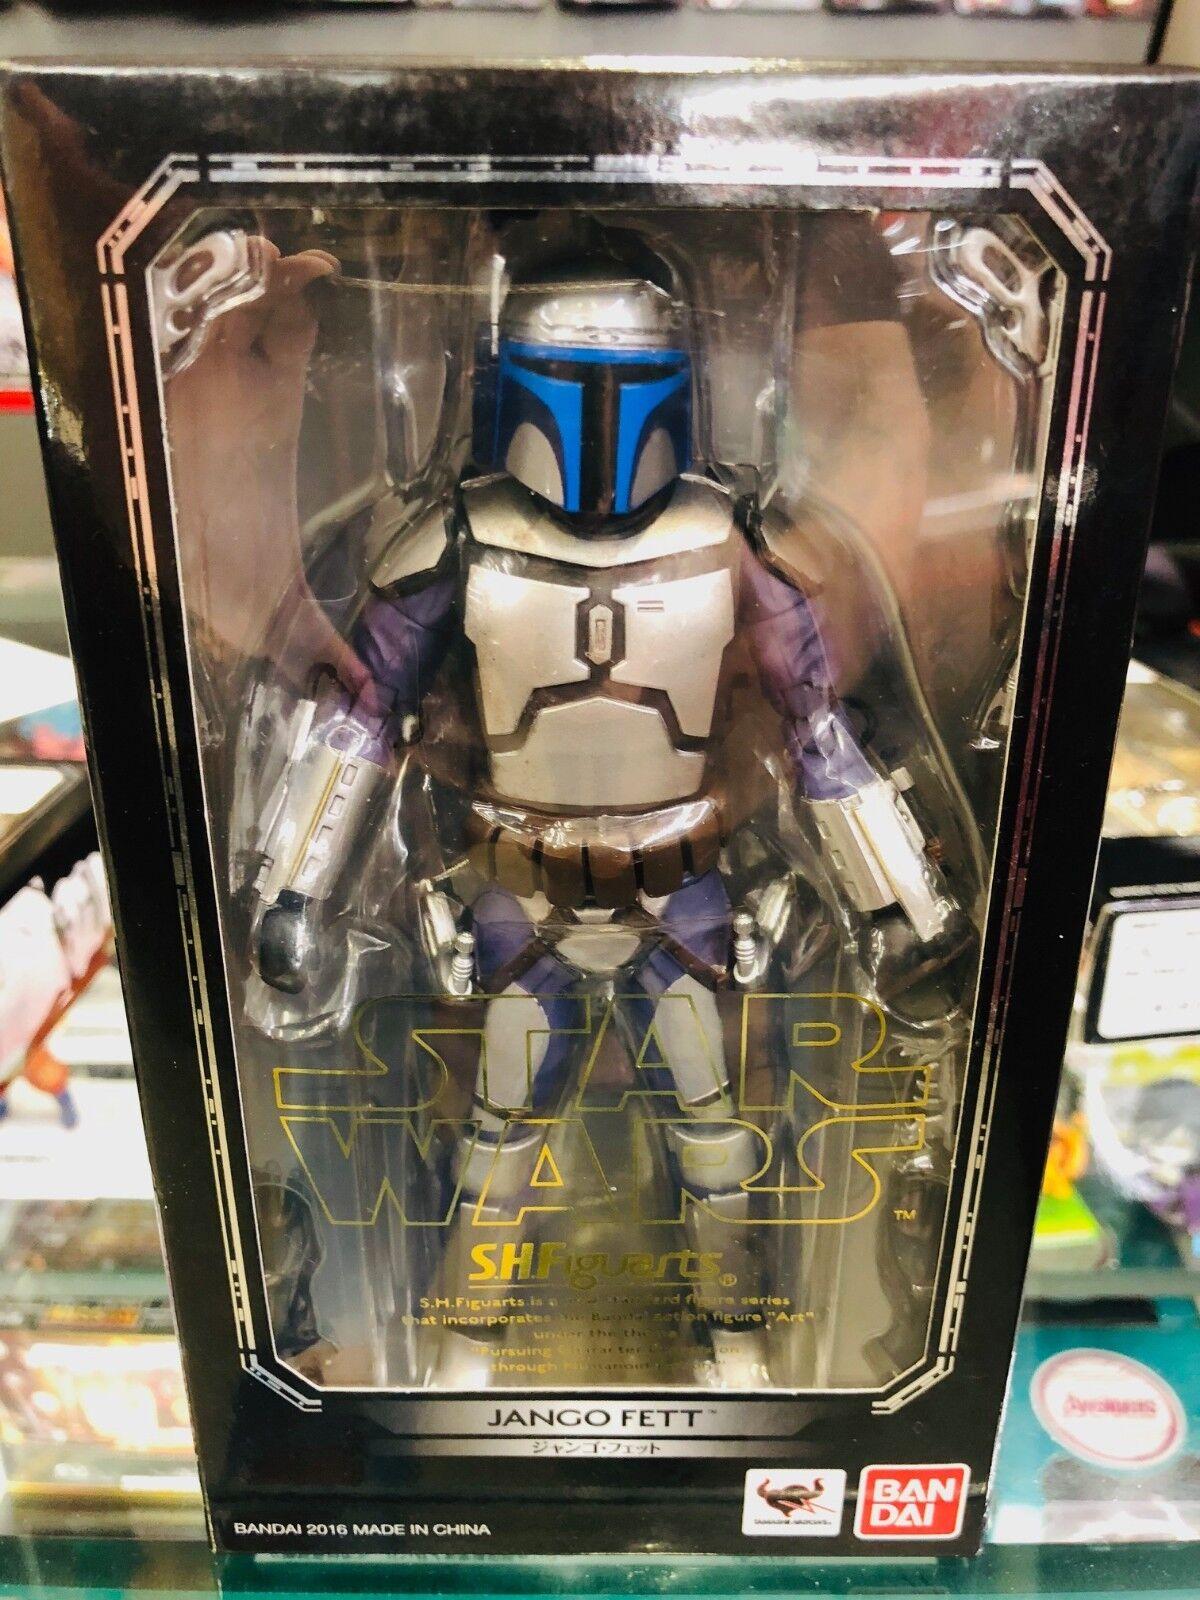 Bandai Star Wars S.H. Figuarts Jango Fett